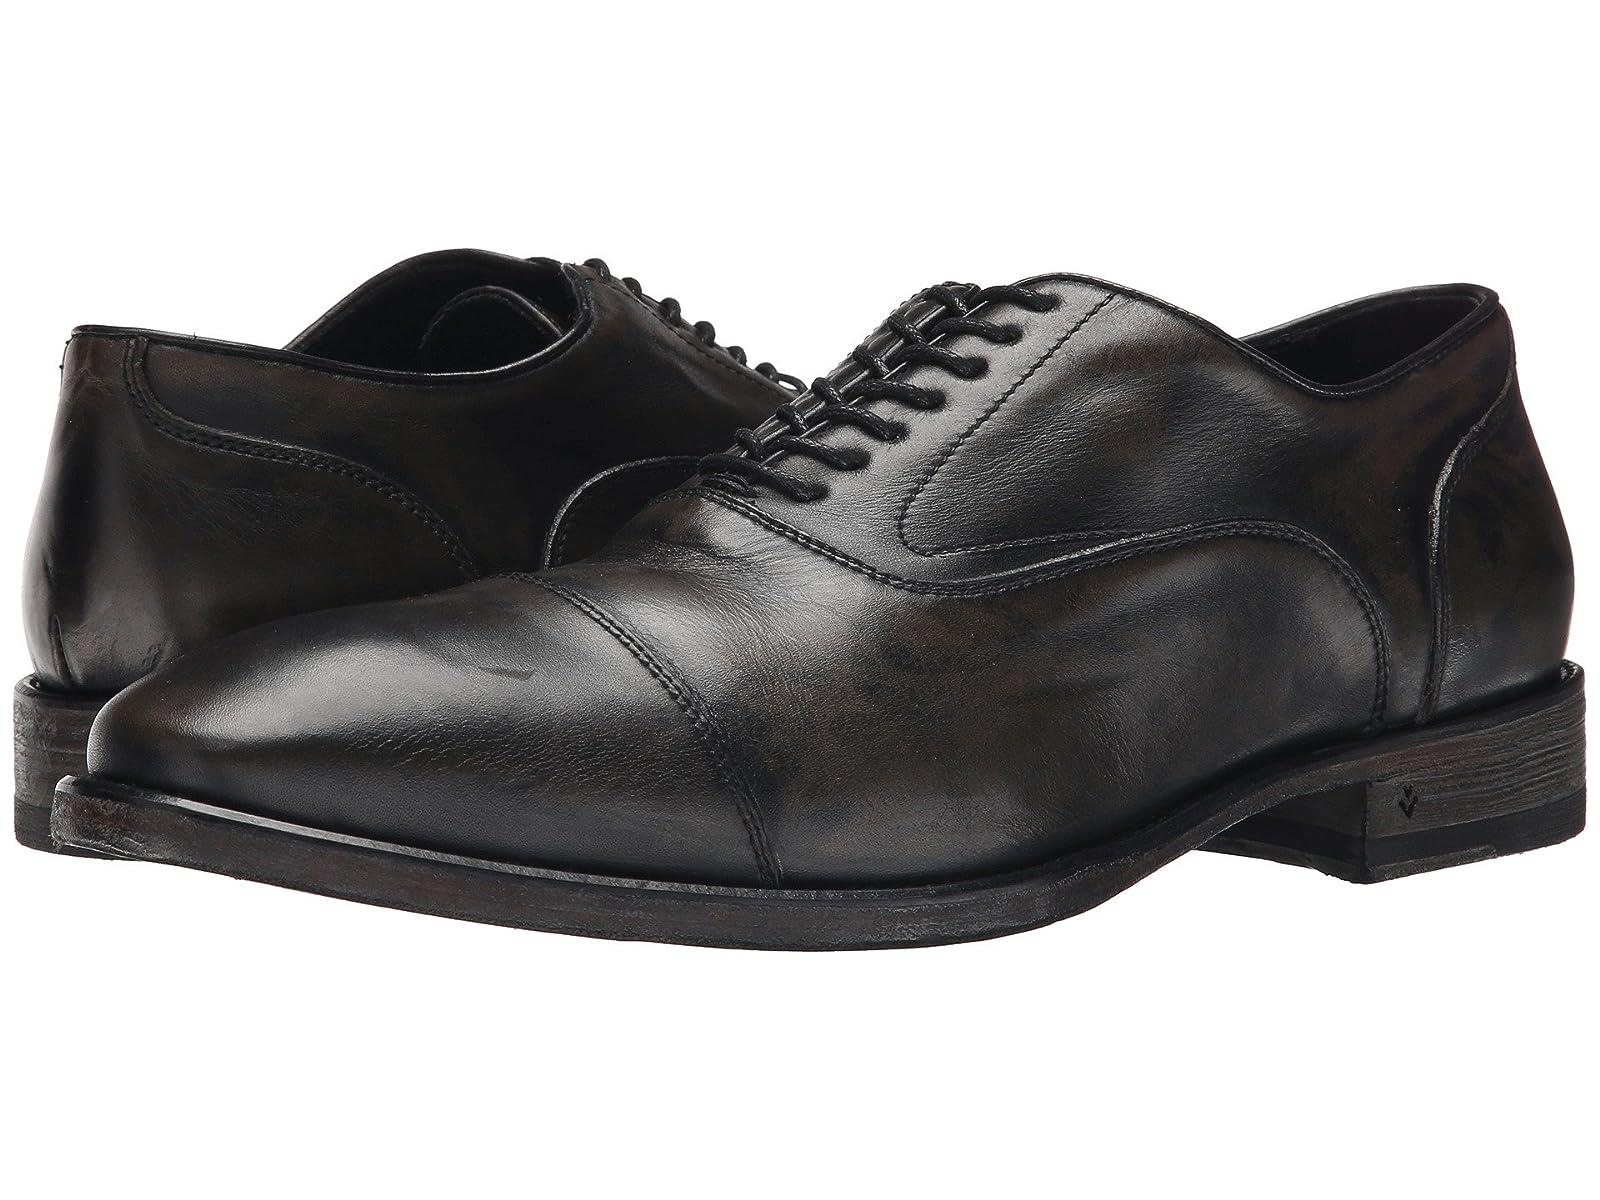 John Varvatos Fleetwood Artisan CapCheap and distinctive eye-catching shoes